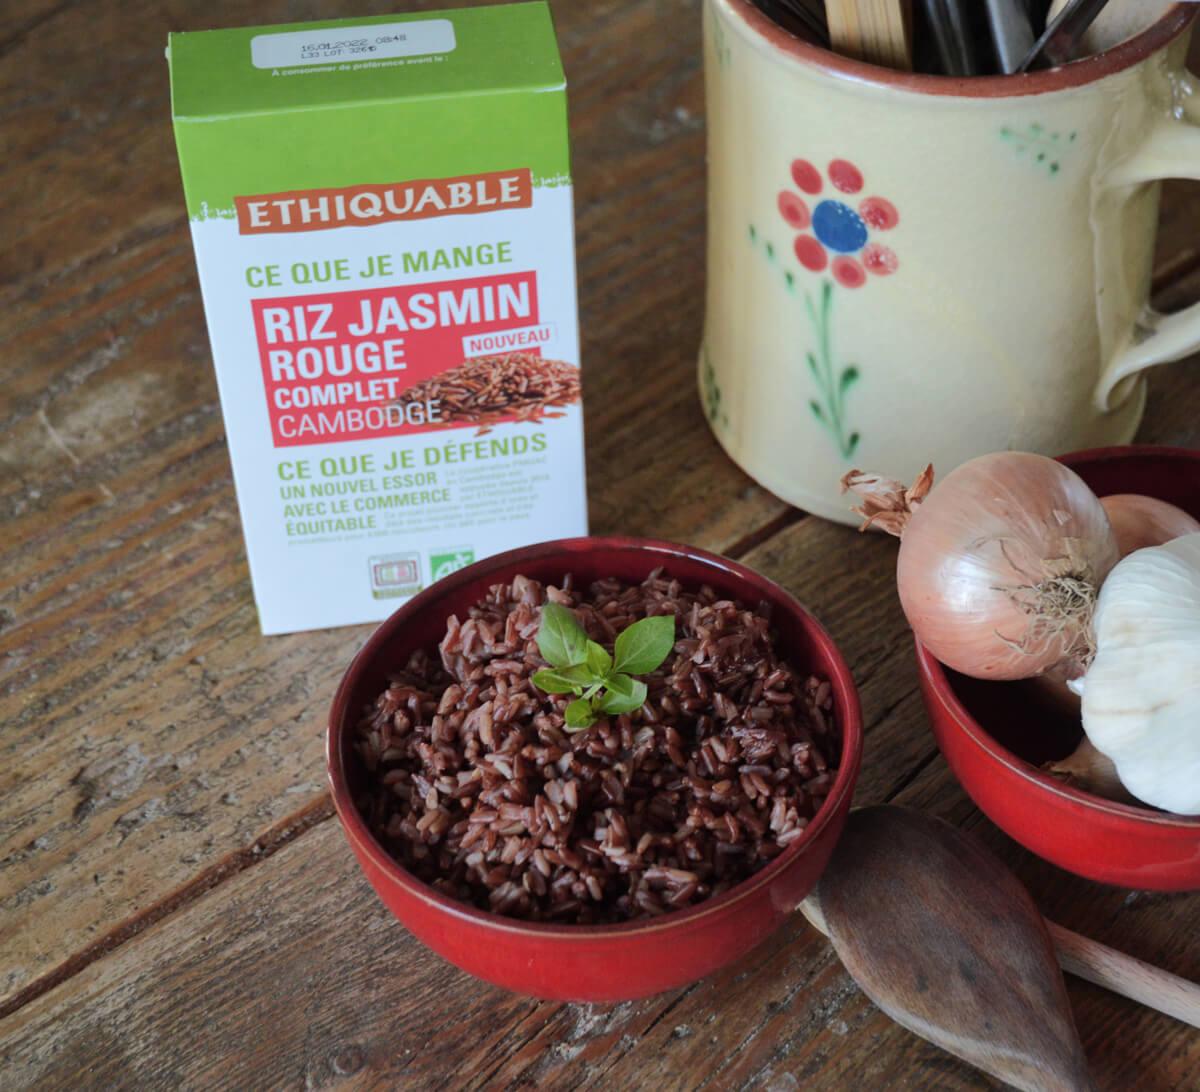 Riz jasmin rouge bio complet du Cambodge issu du Commerce Equitable I Ethiquable